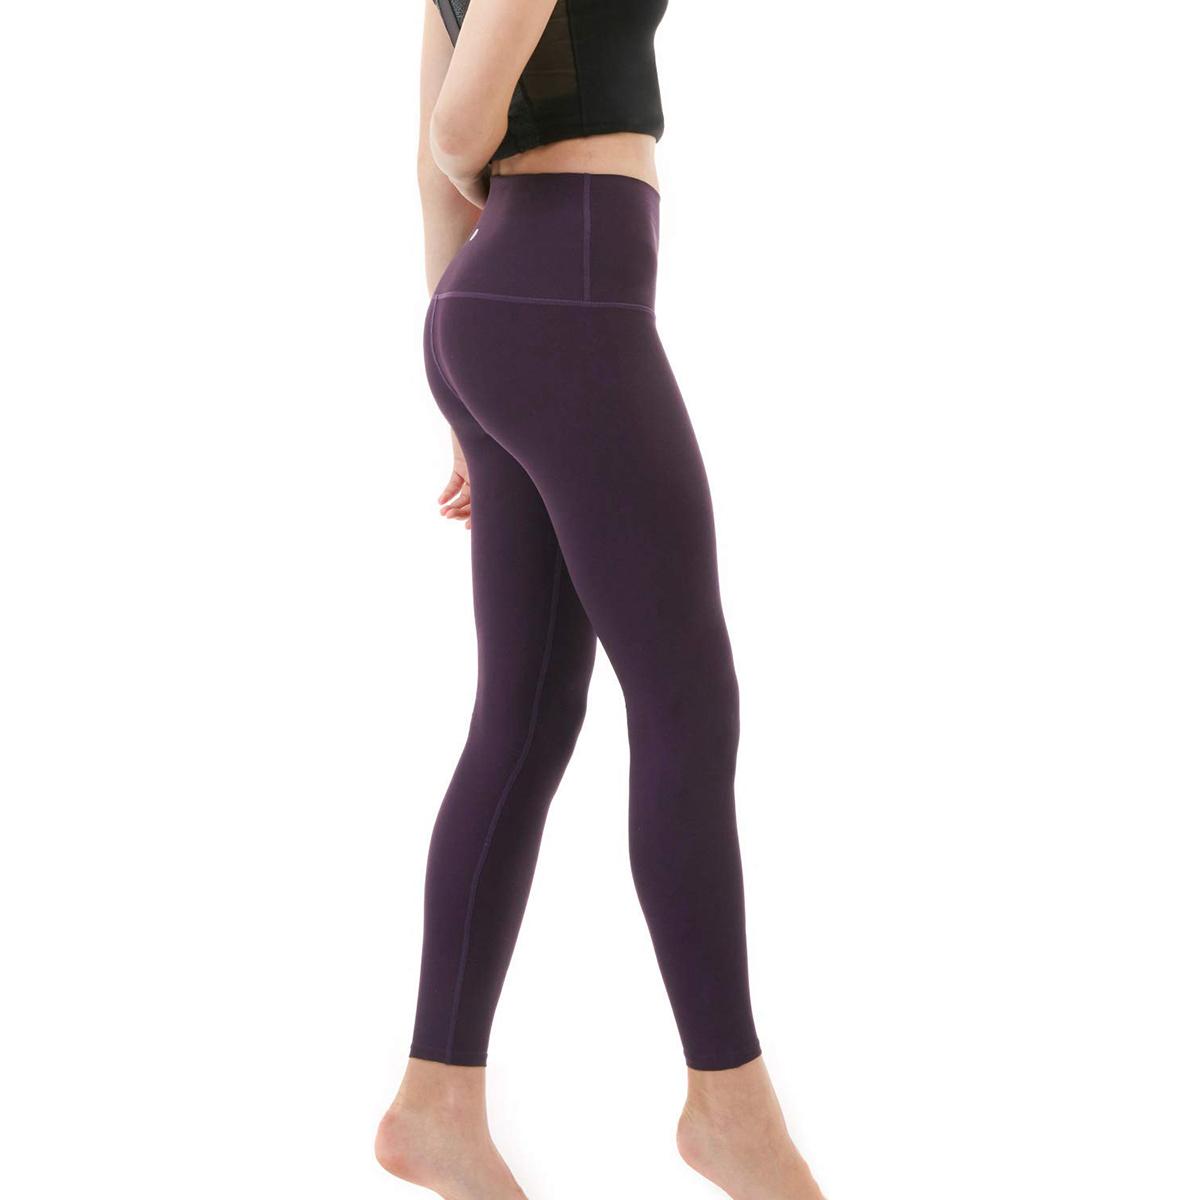 thumbnail 25 - TSLA Tesla FYP52 Women's High-Waisted Ultra-Stretch Tummy Control Yoga Pants